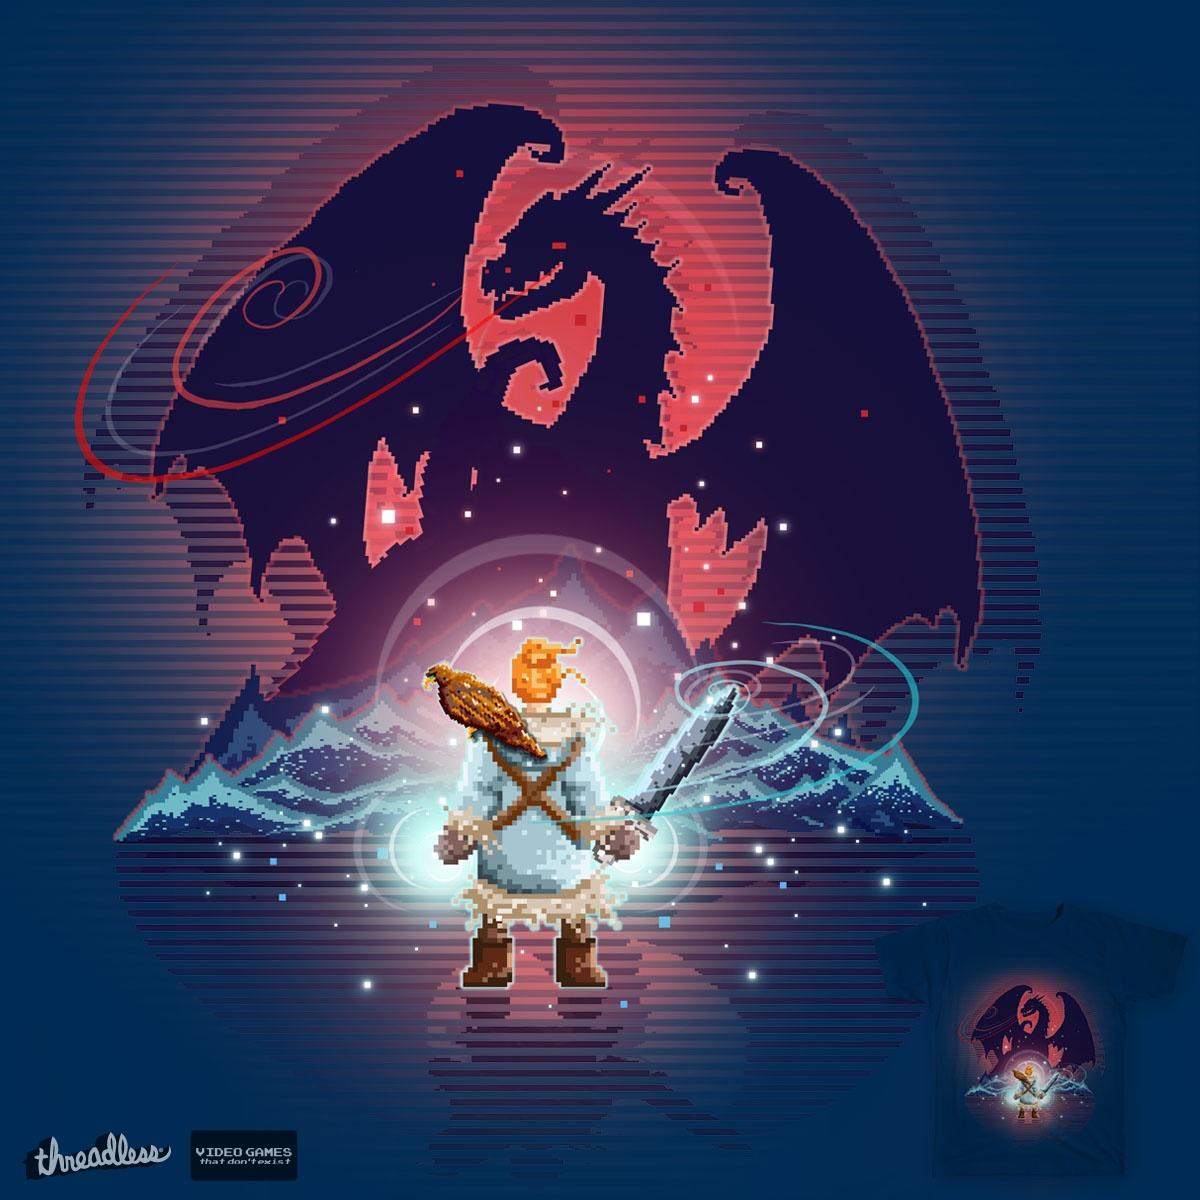 Sylvan's Legend by RoseMakesArt on Threadless